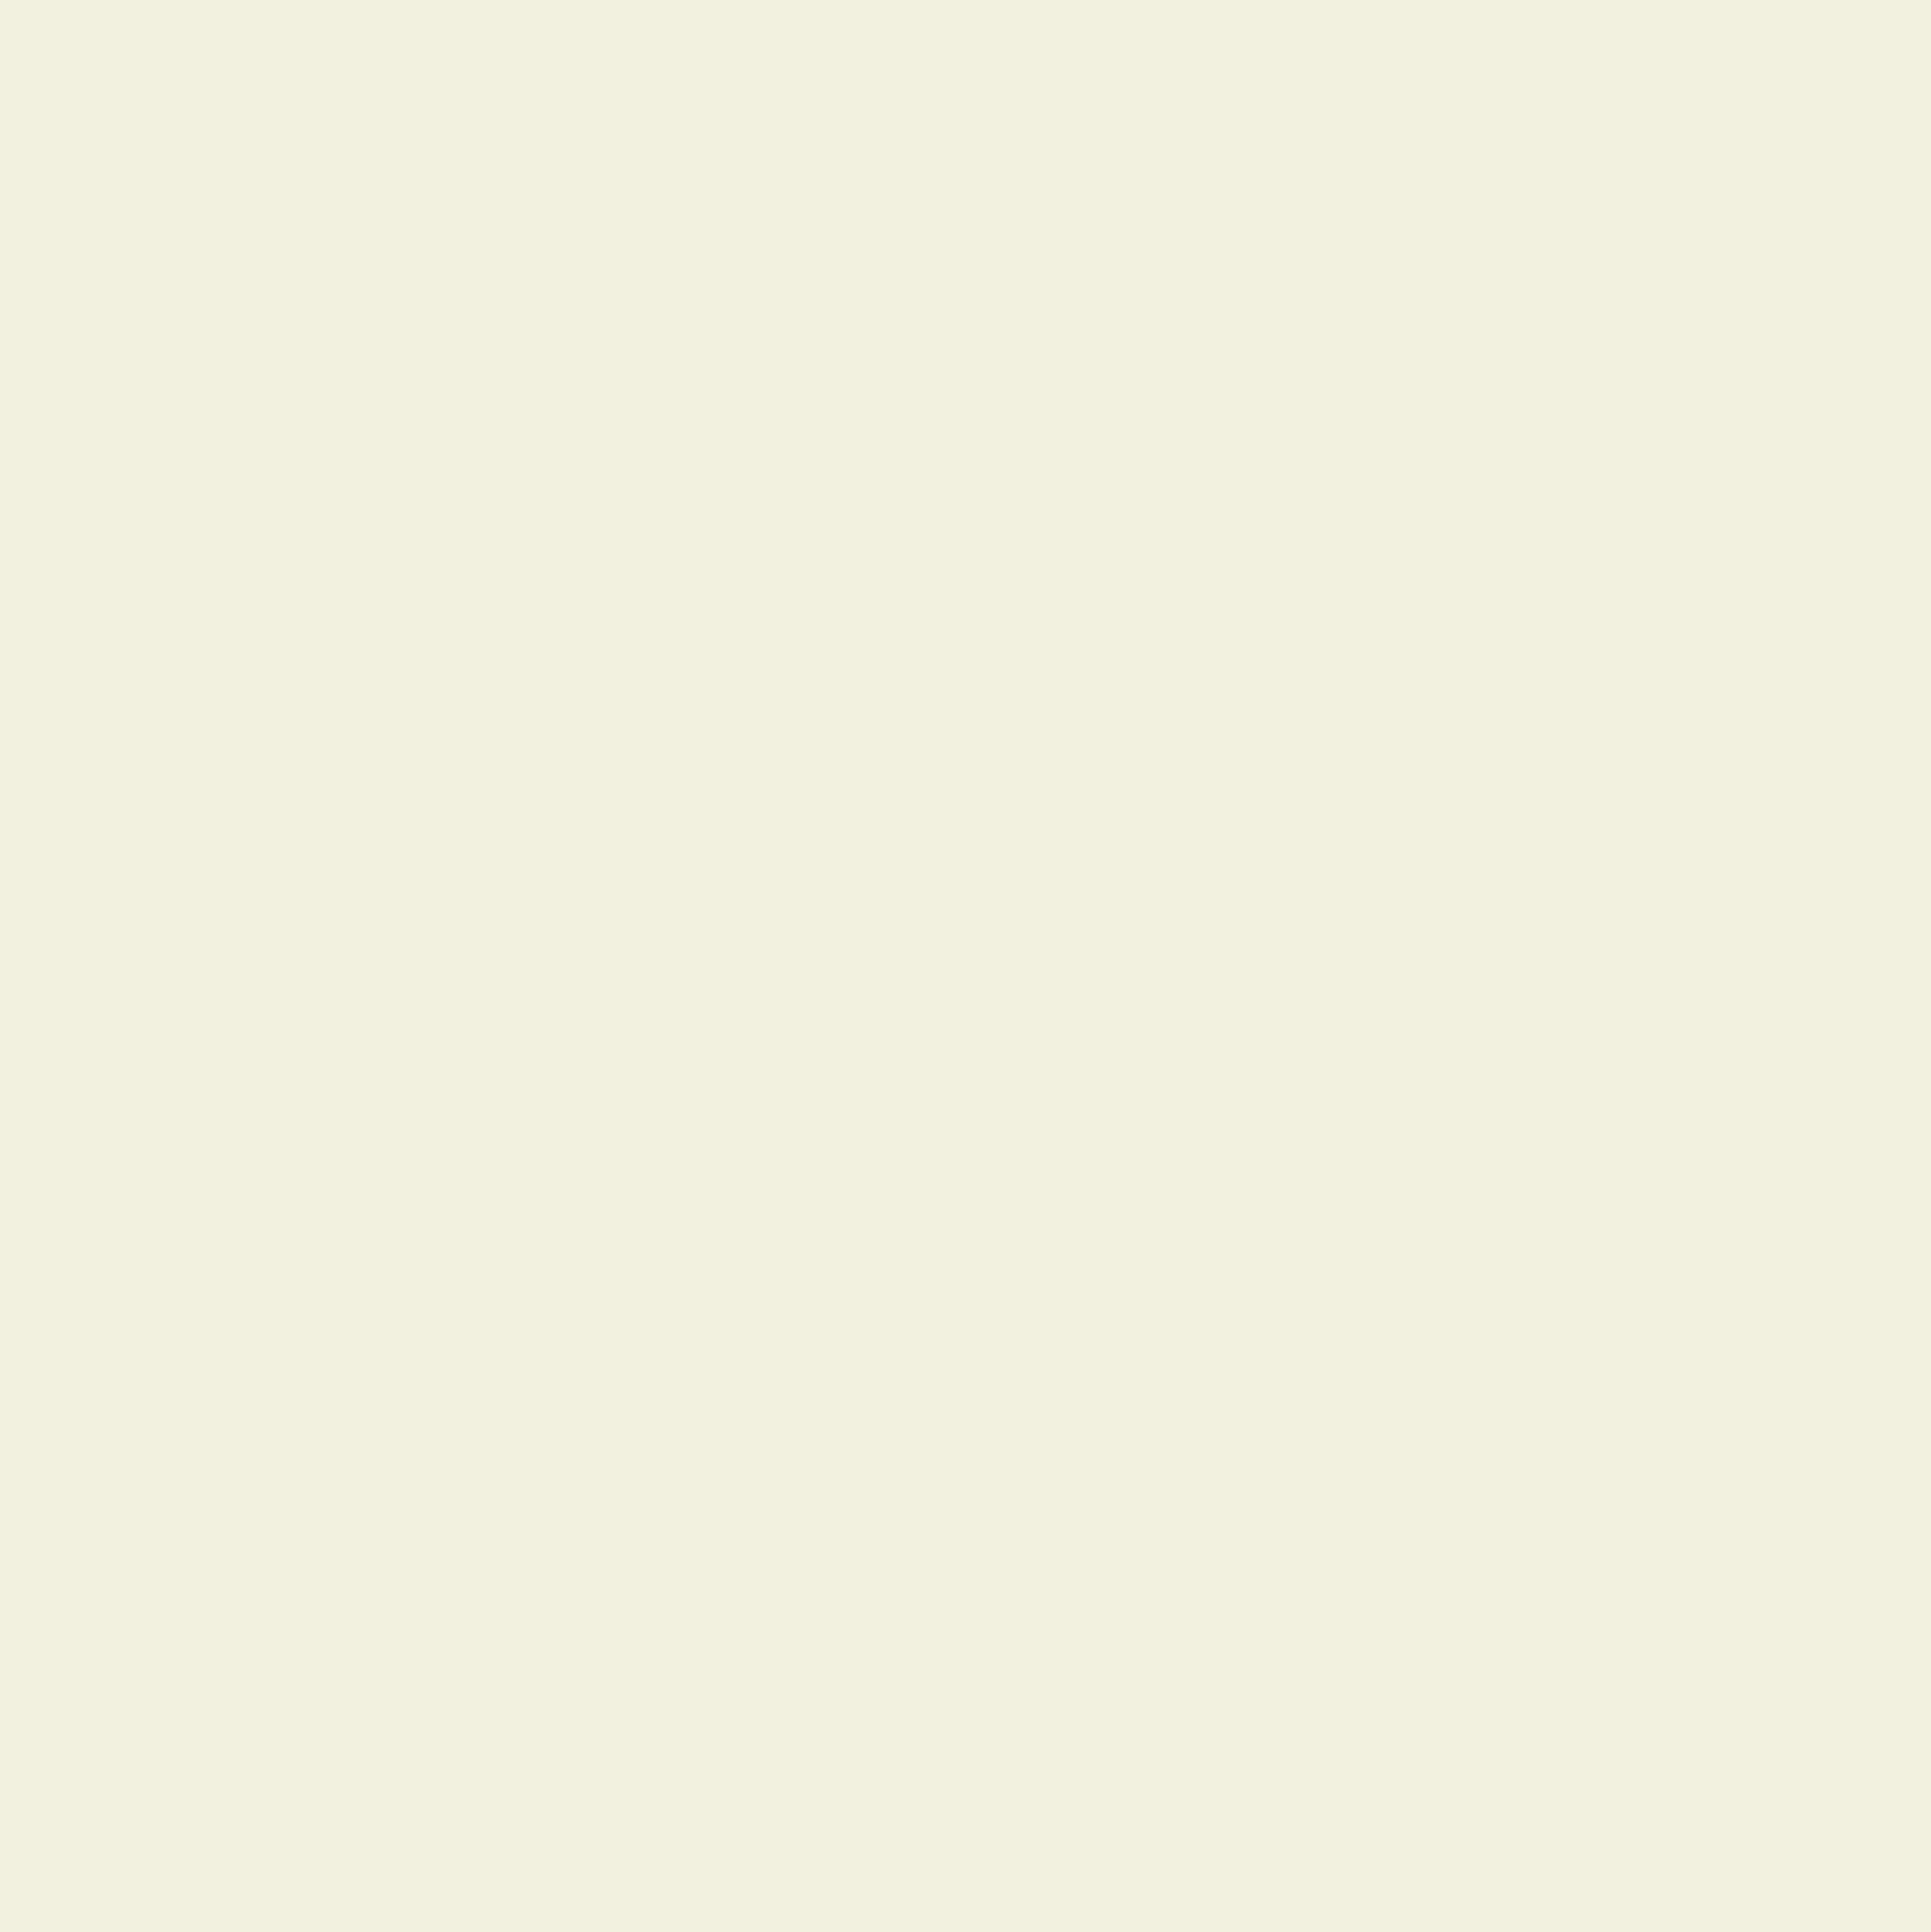 Mantel CRUDOColorLiso Rectangular 1,5x2,4m [enstockpara envíooretiro]